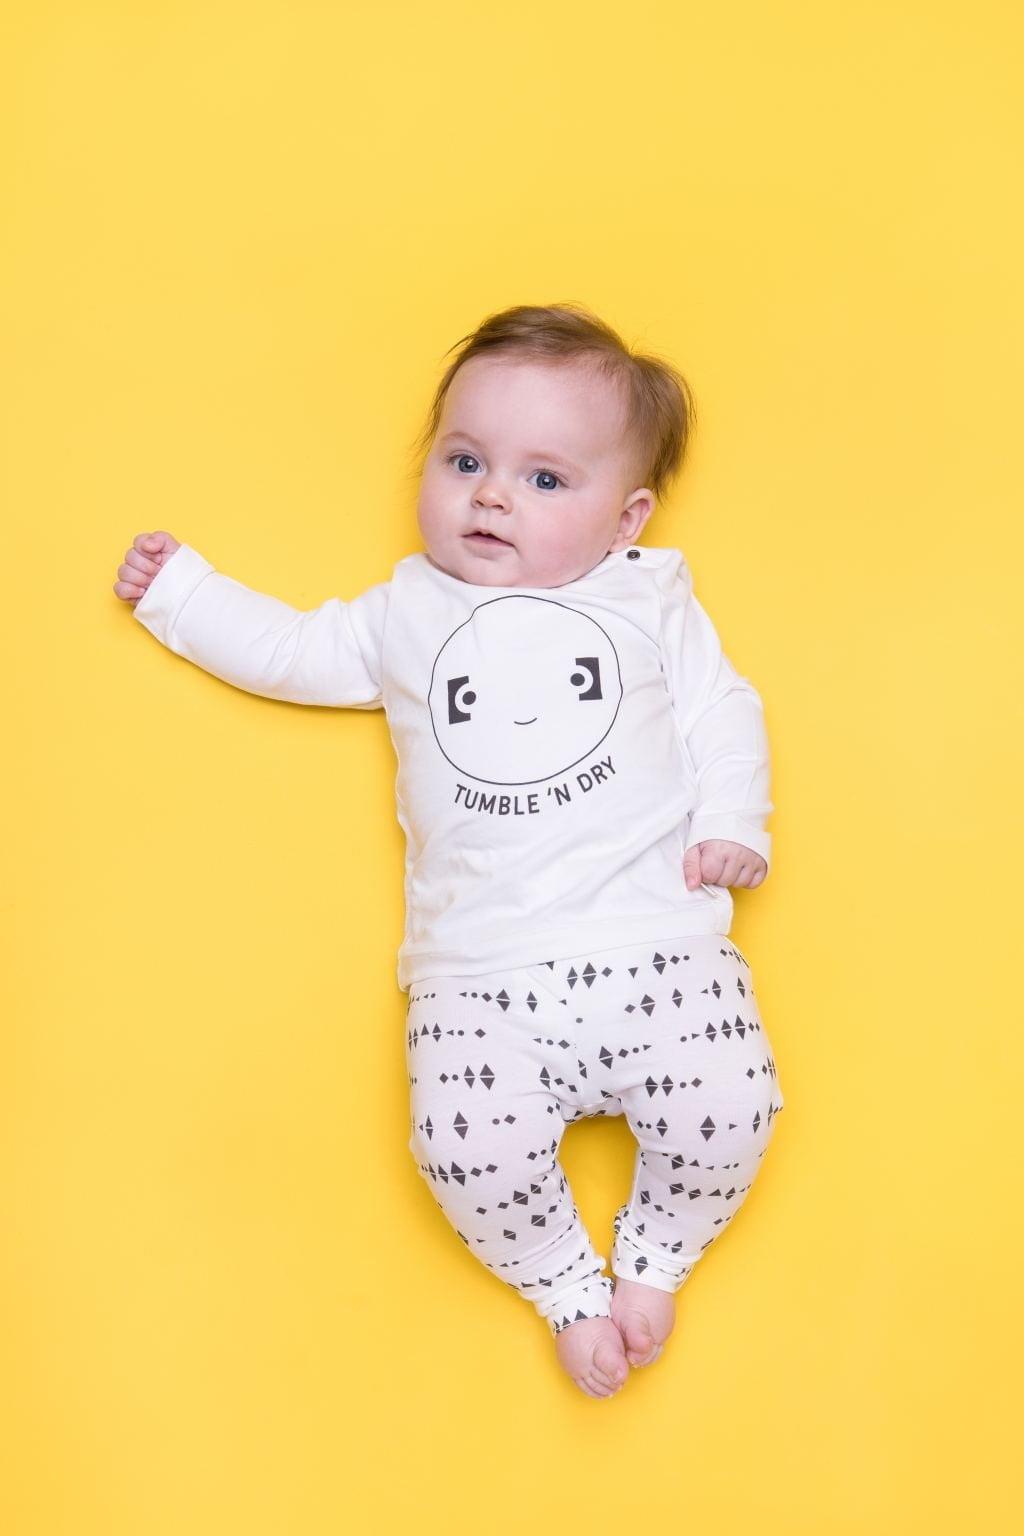 kixx_online_mamablogger_noppies_babykleding_pre spring_Marisca_Tumble_